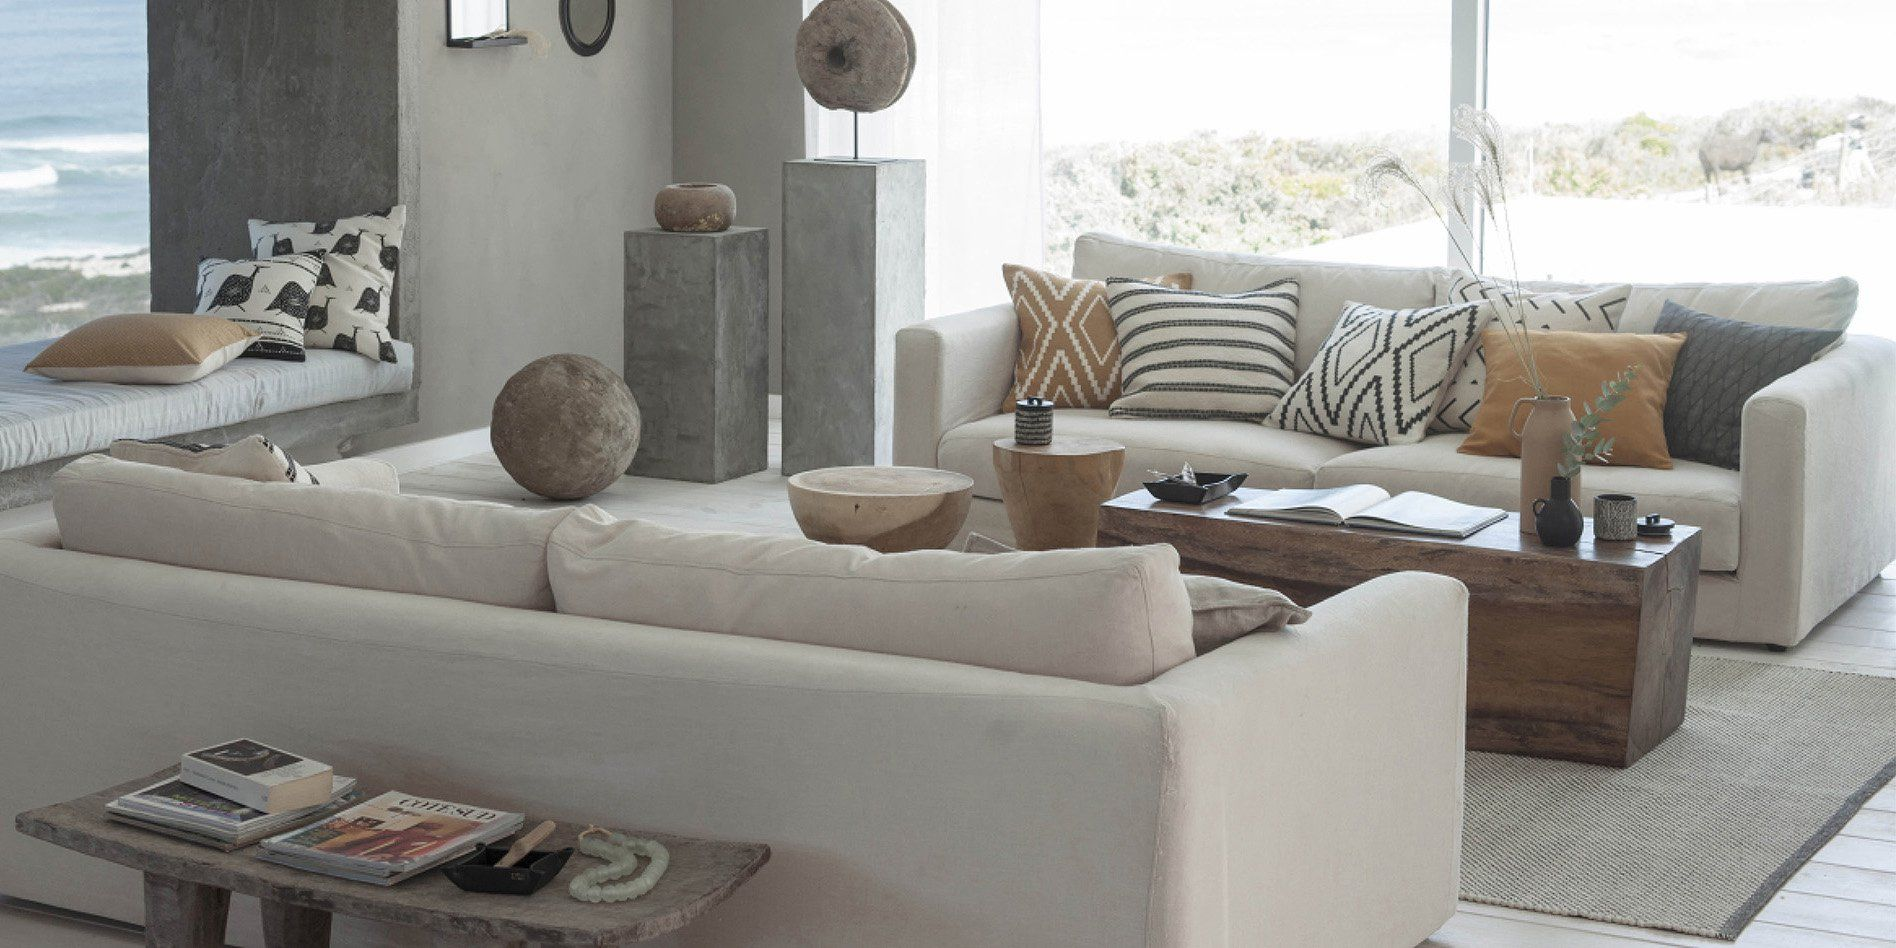 l 39 automne s 39 annonce scandi cool avec h m home s w e e t. Black Bedroom Furniture Sets. Home Design Ideas